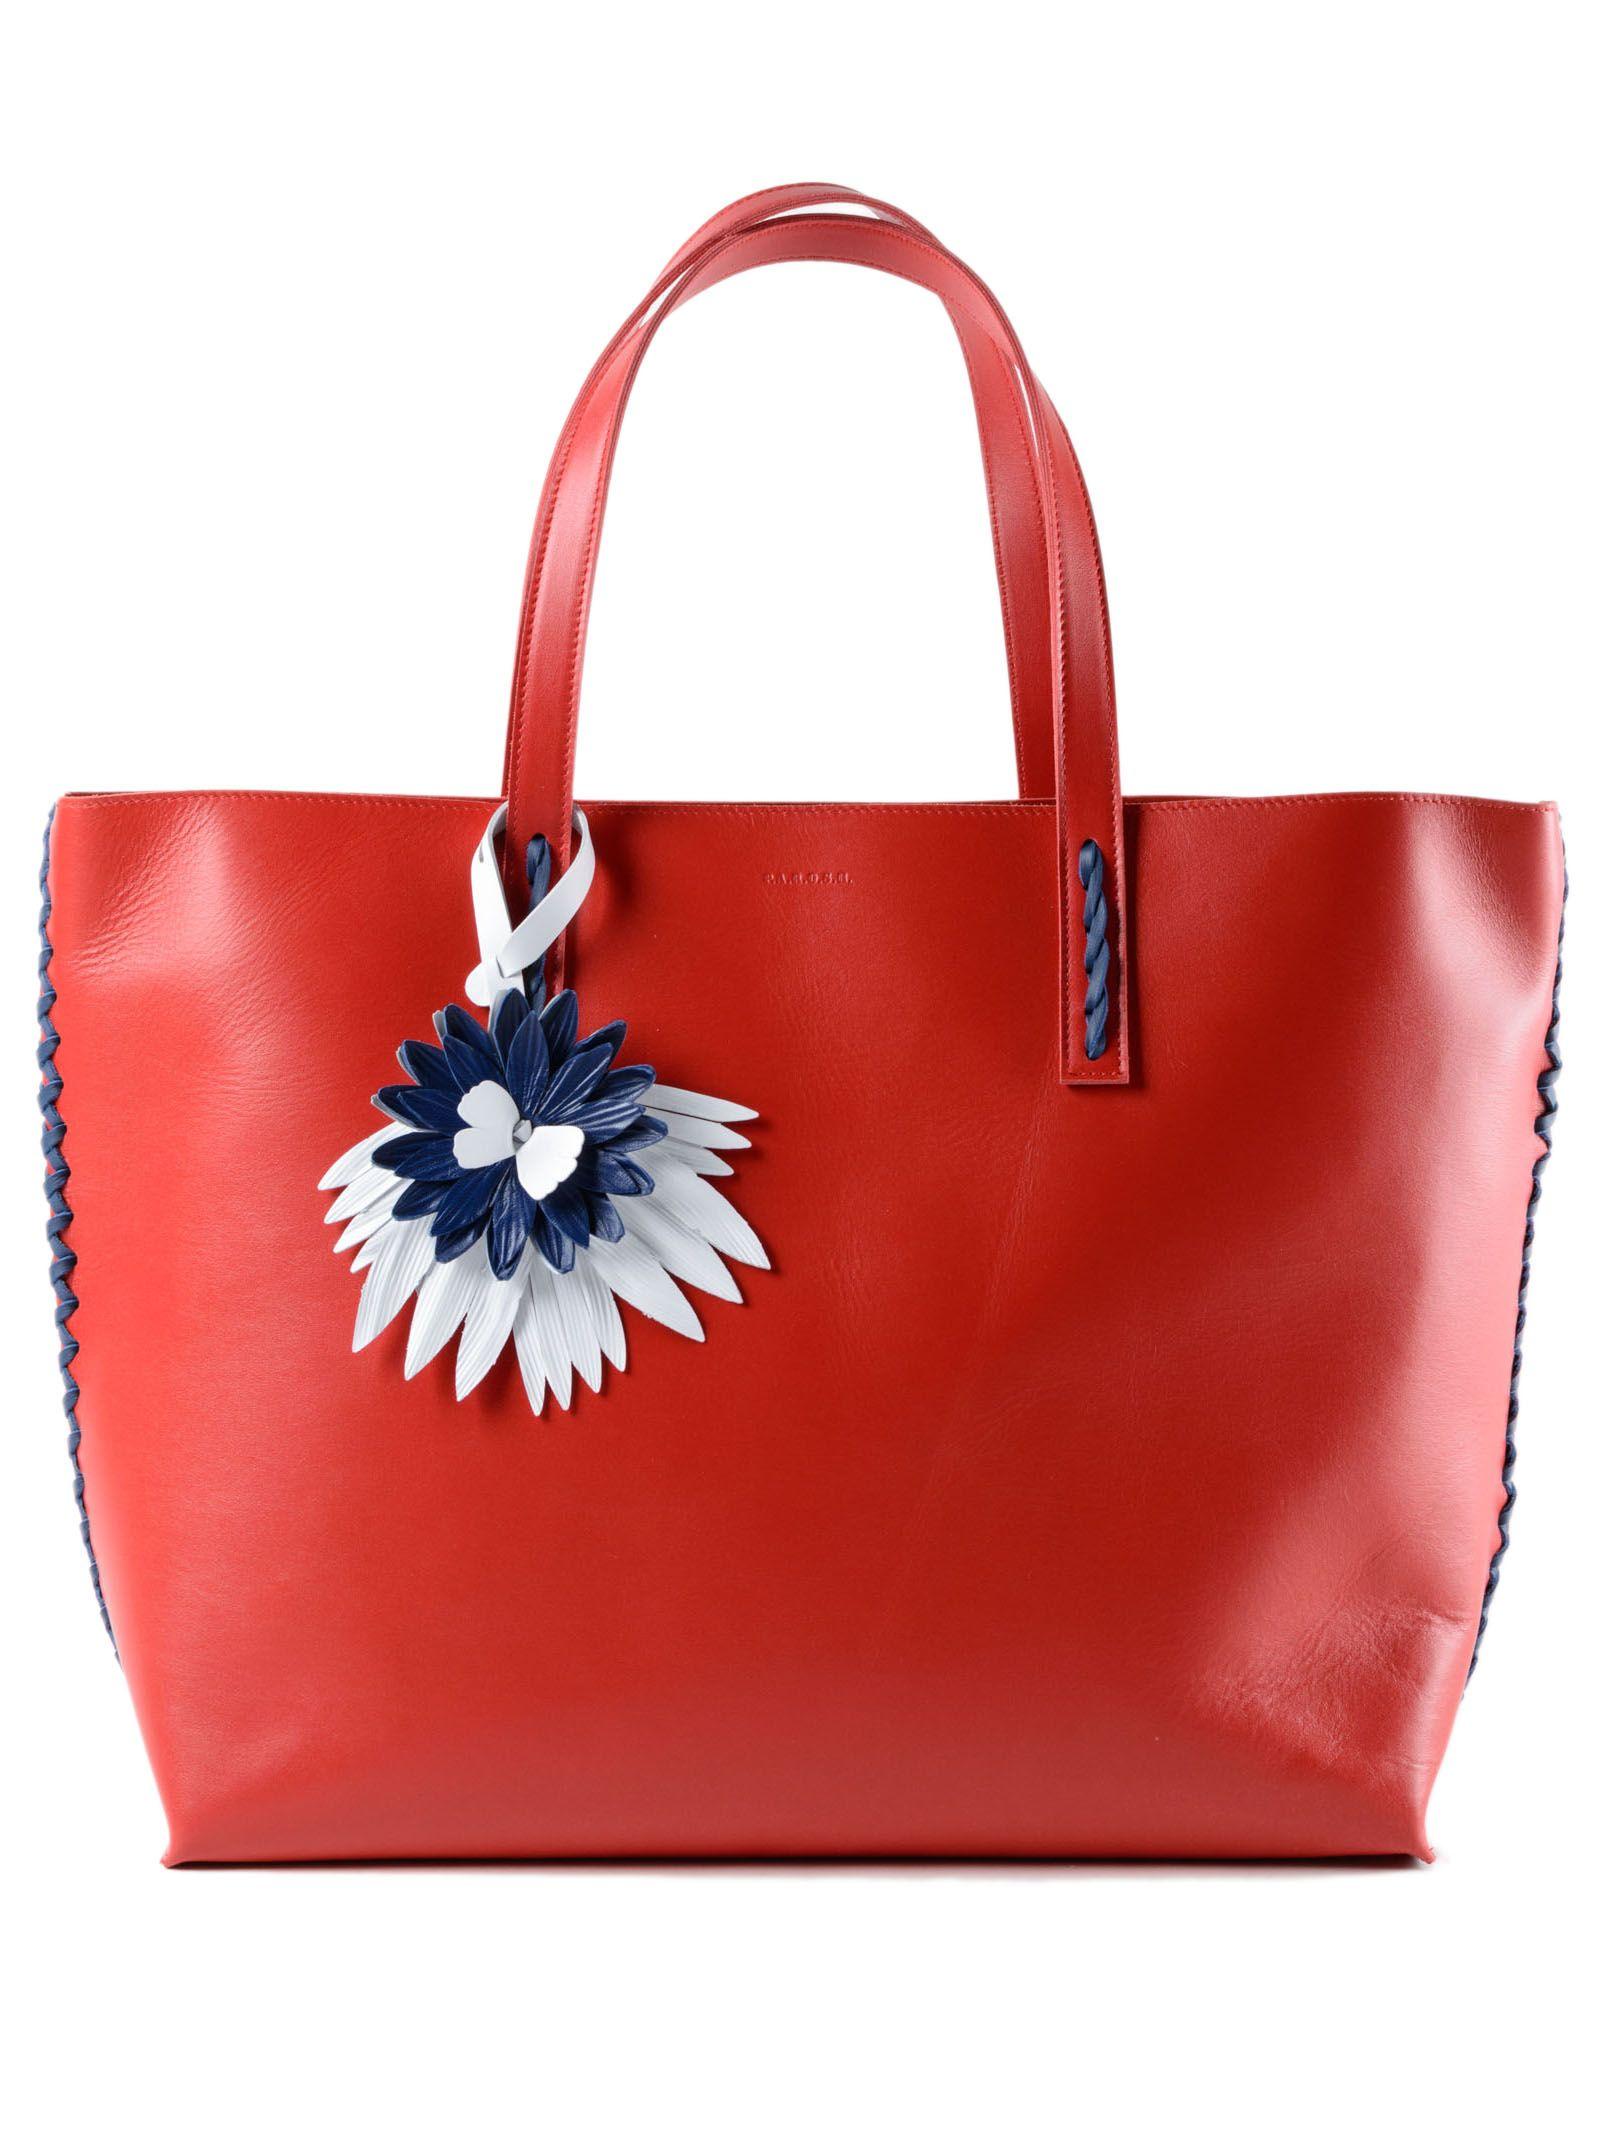 P.A.R.O.S.H. Tote Bag On Sale, Beige, Leather, 2017, one size